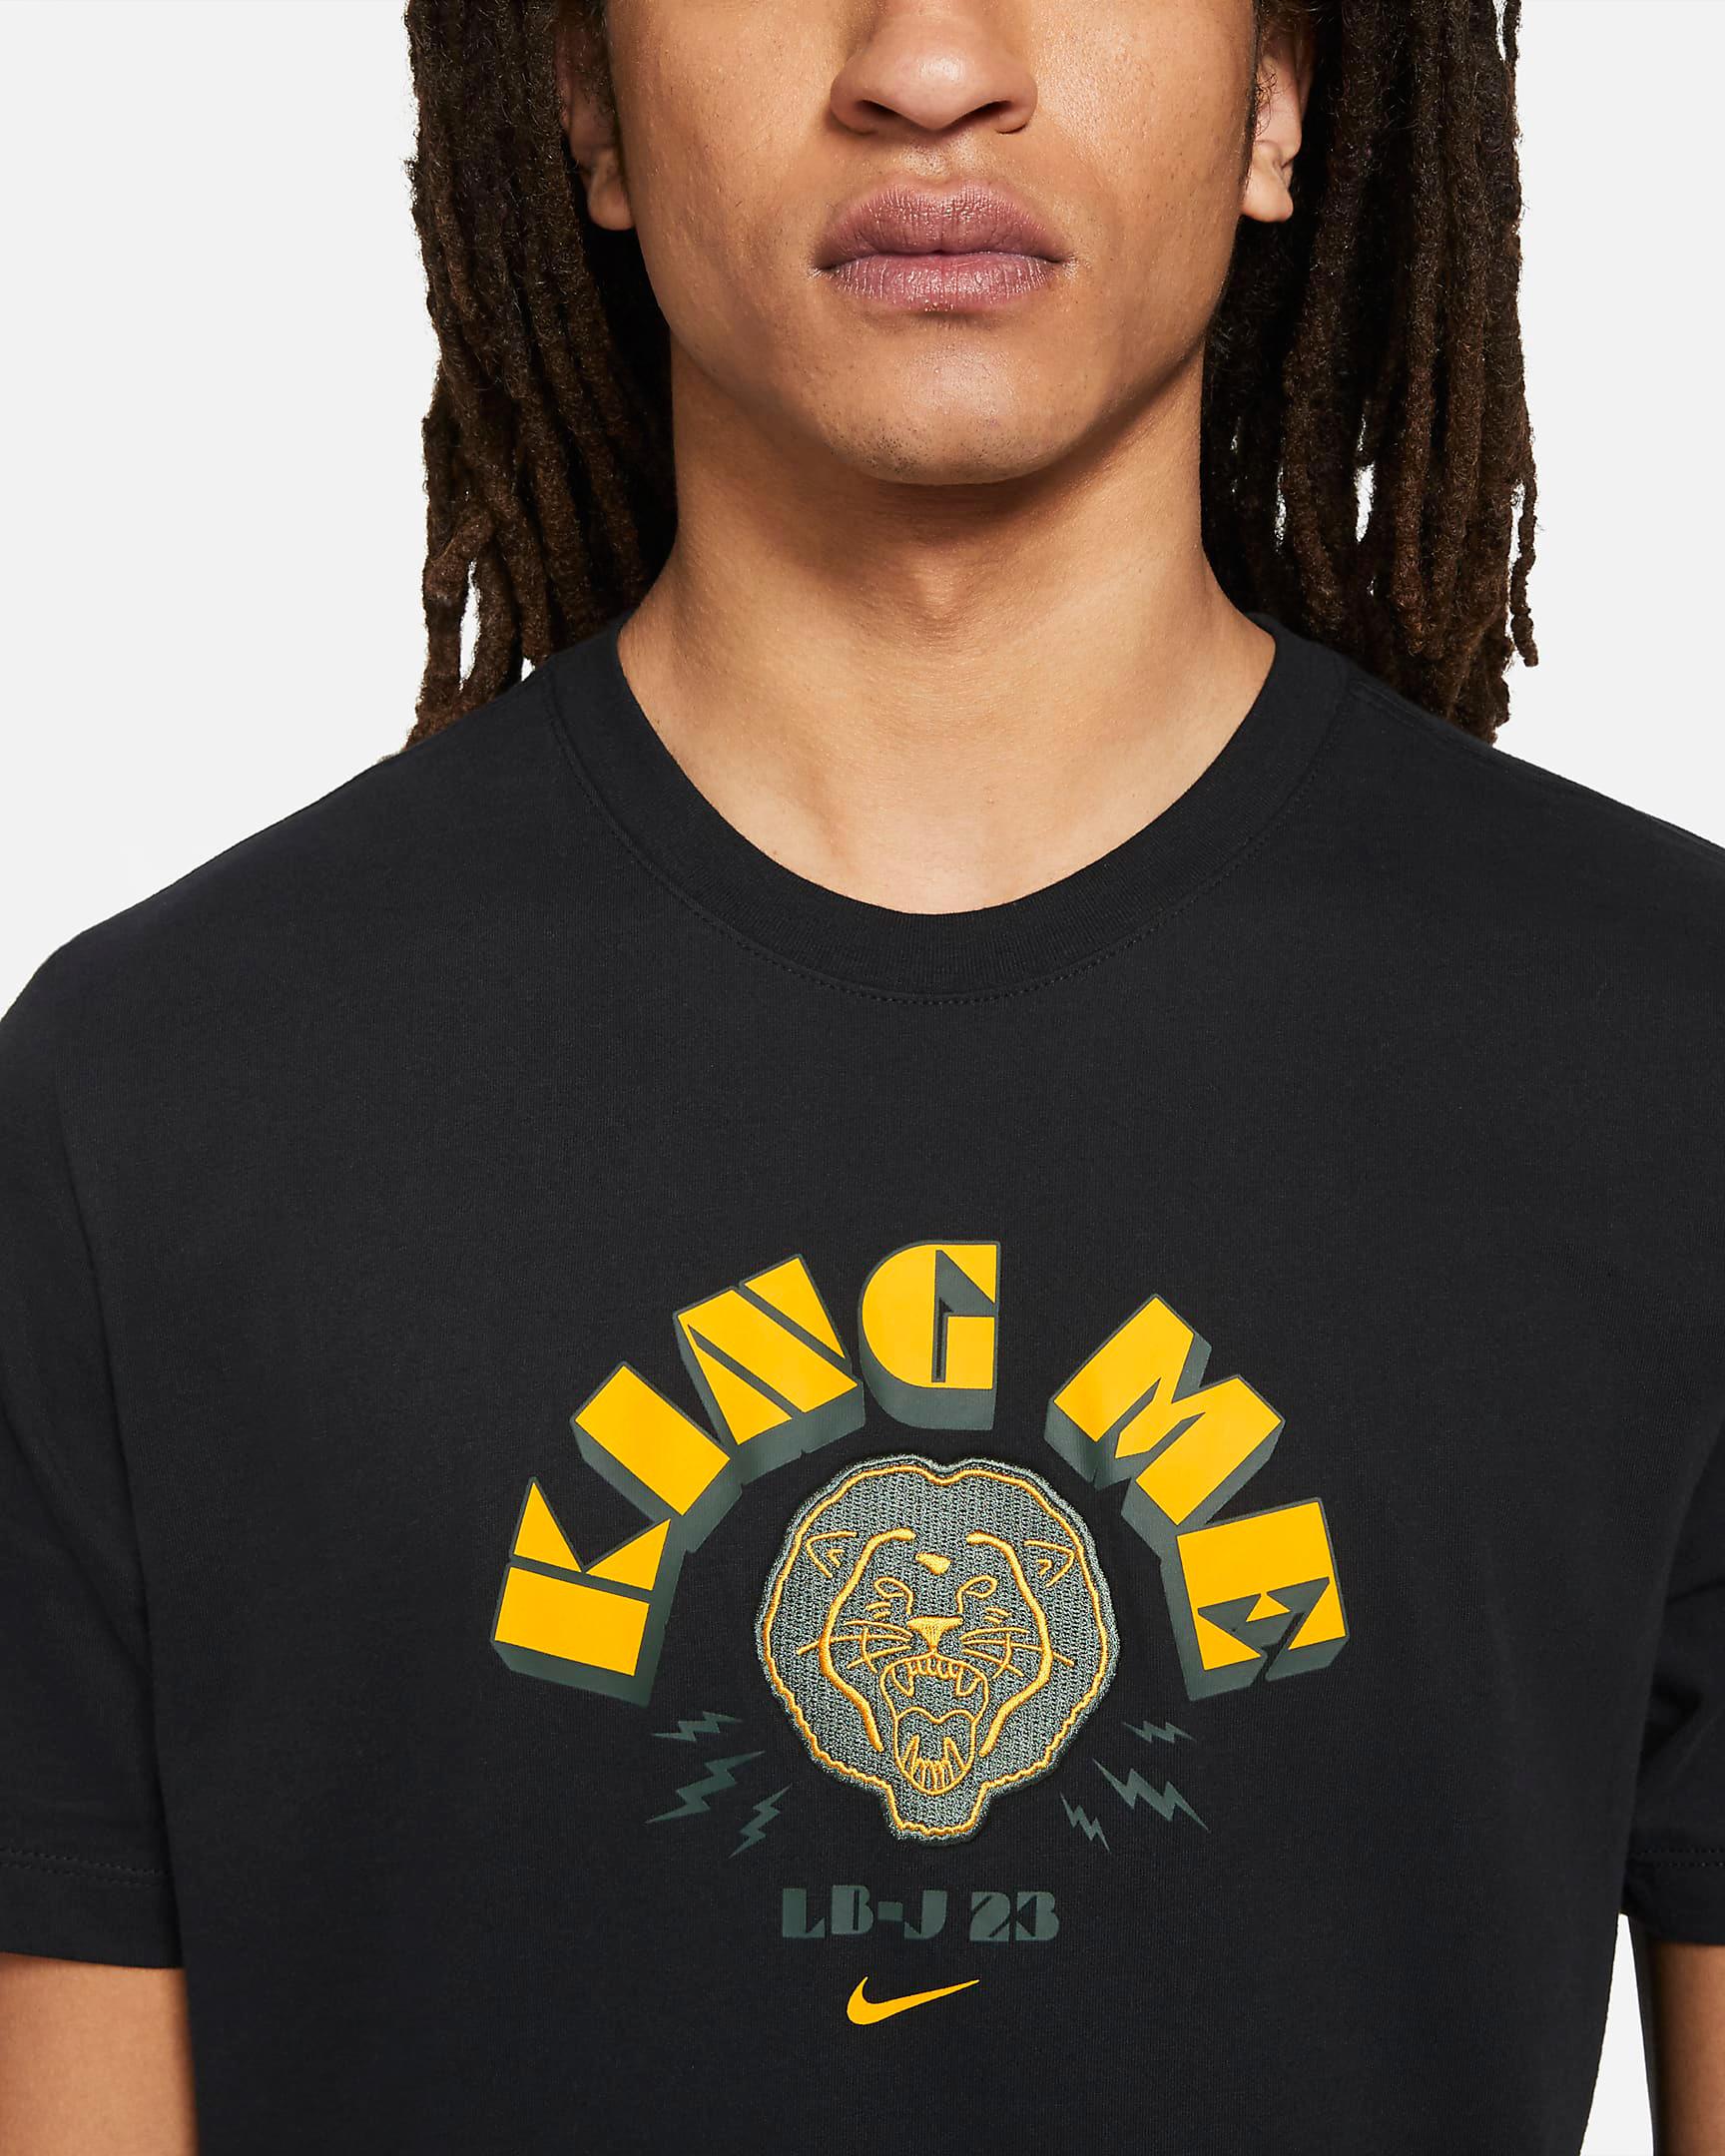 nike-lebron-king-me-shirt-black-yellow-gold-2